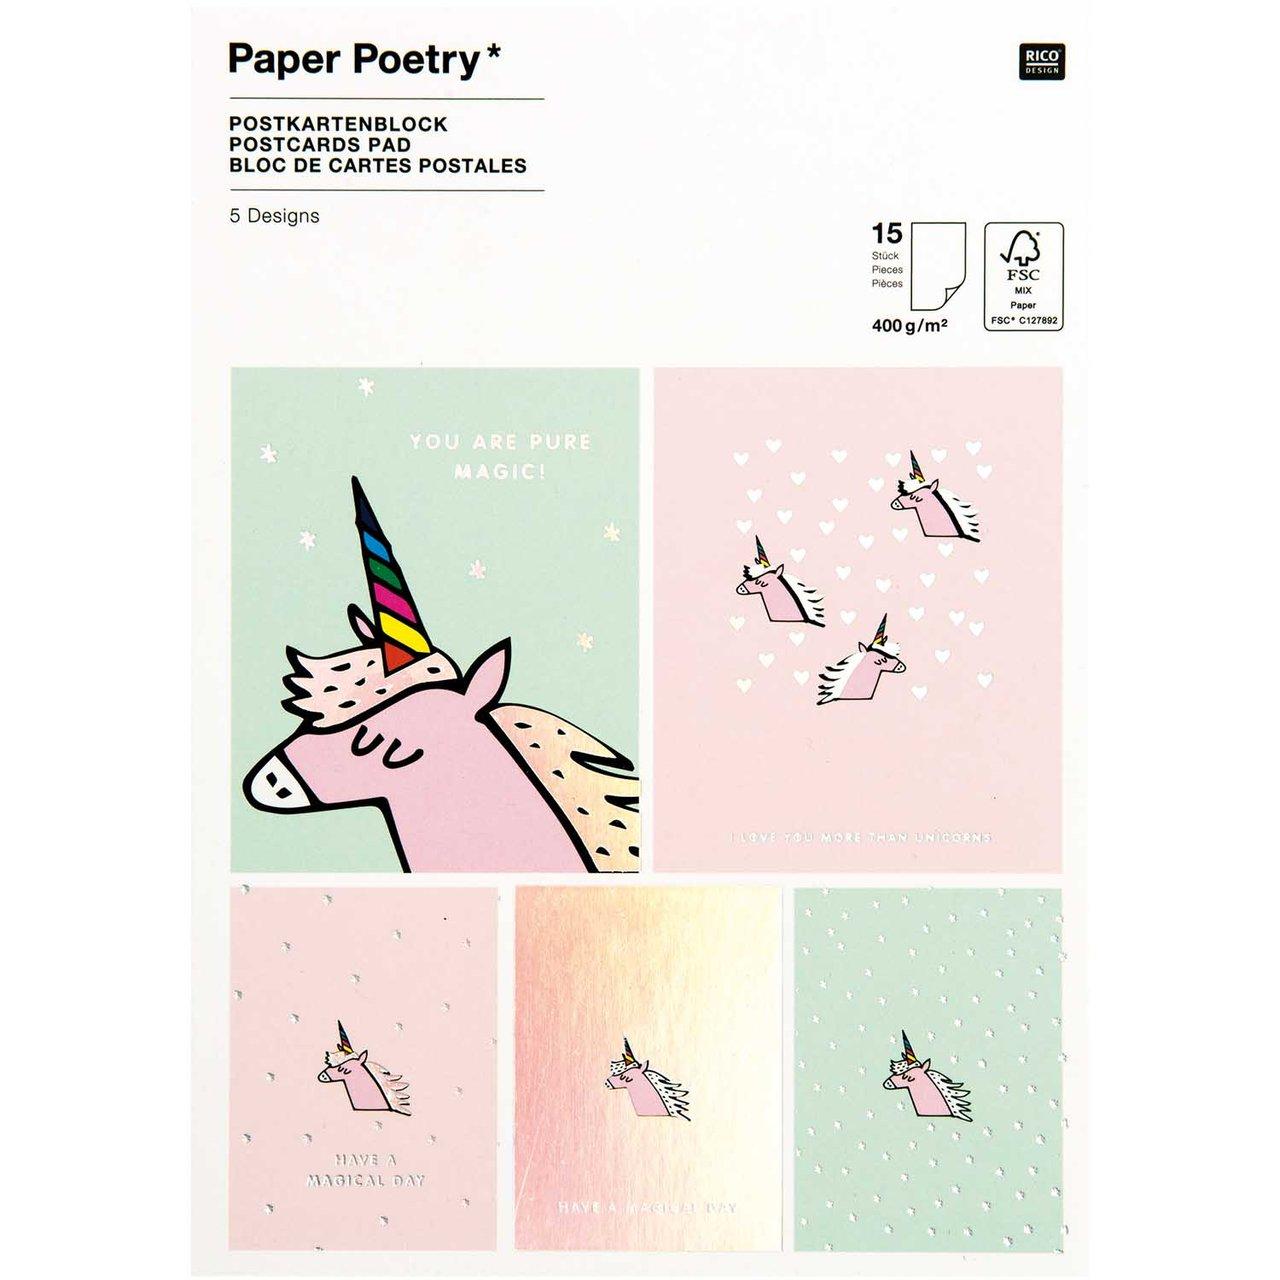 Paper Poetry Postkartenblock Einhorn 400g/m² 15...